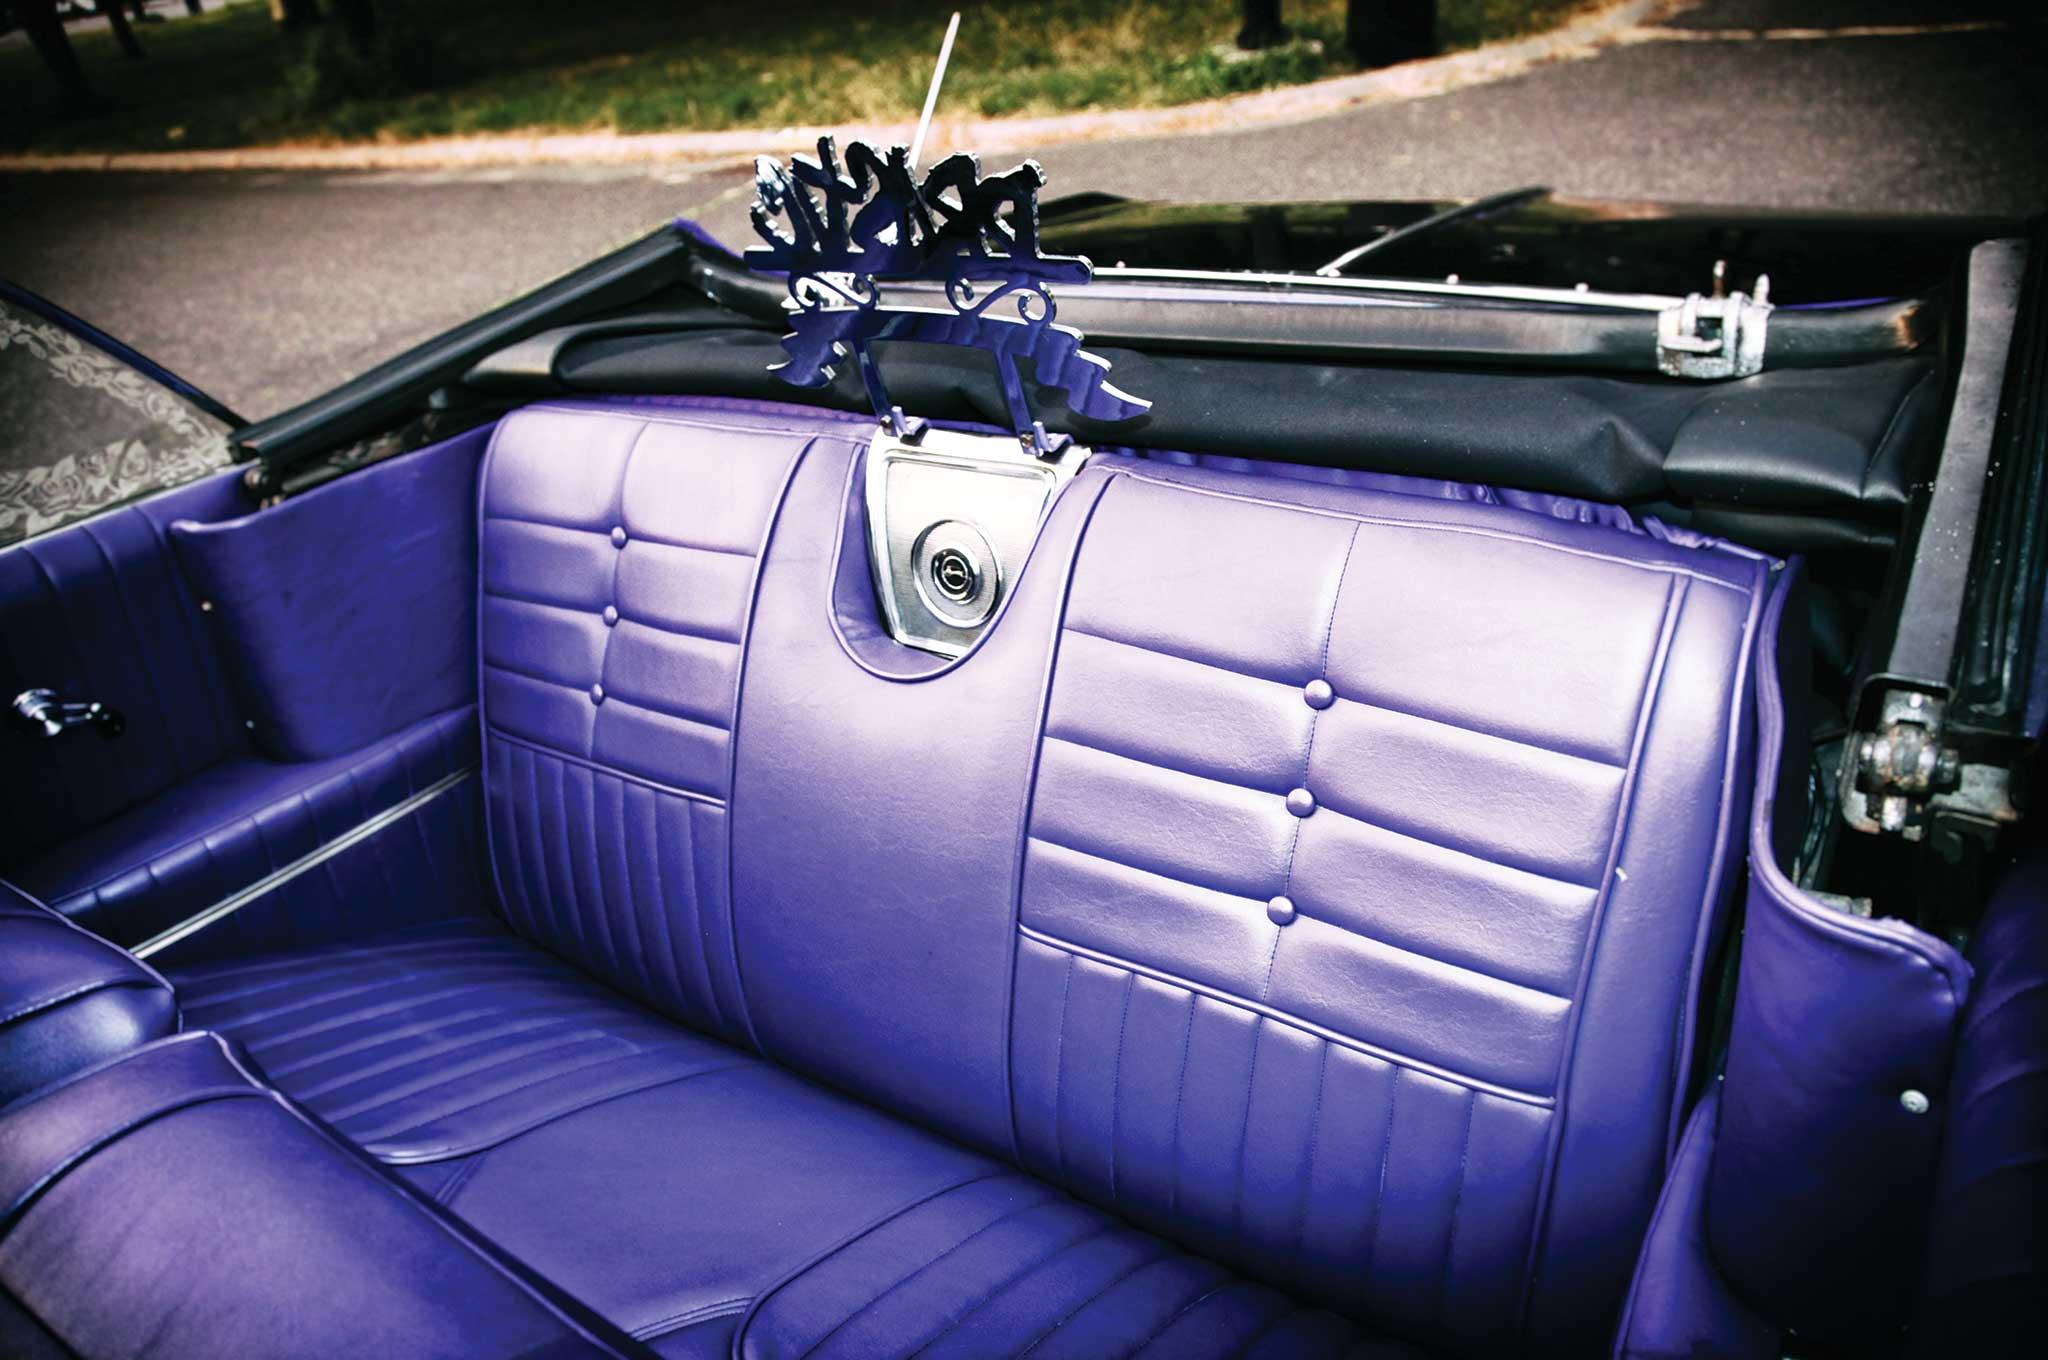 1964 chevy impala 283 wiring diagram